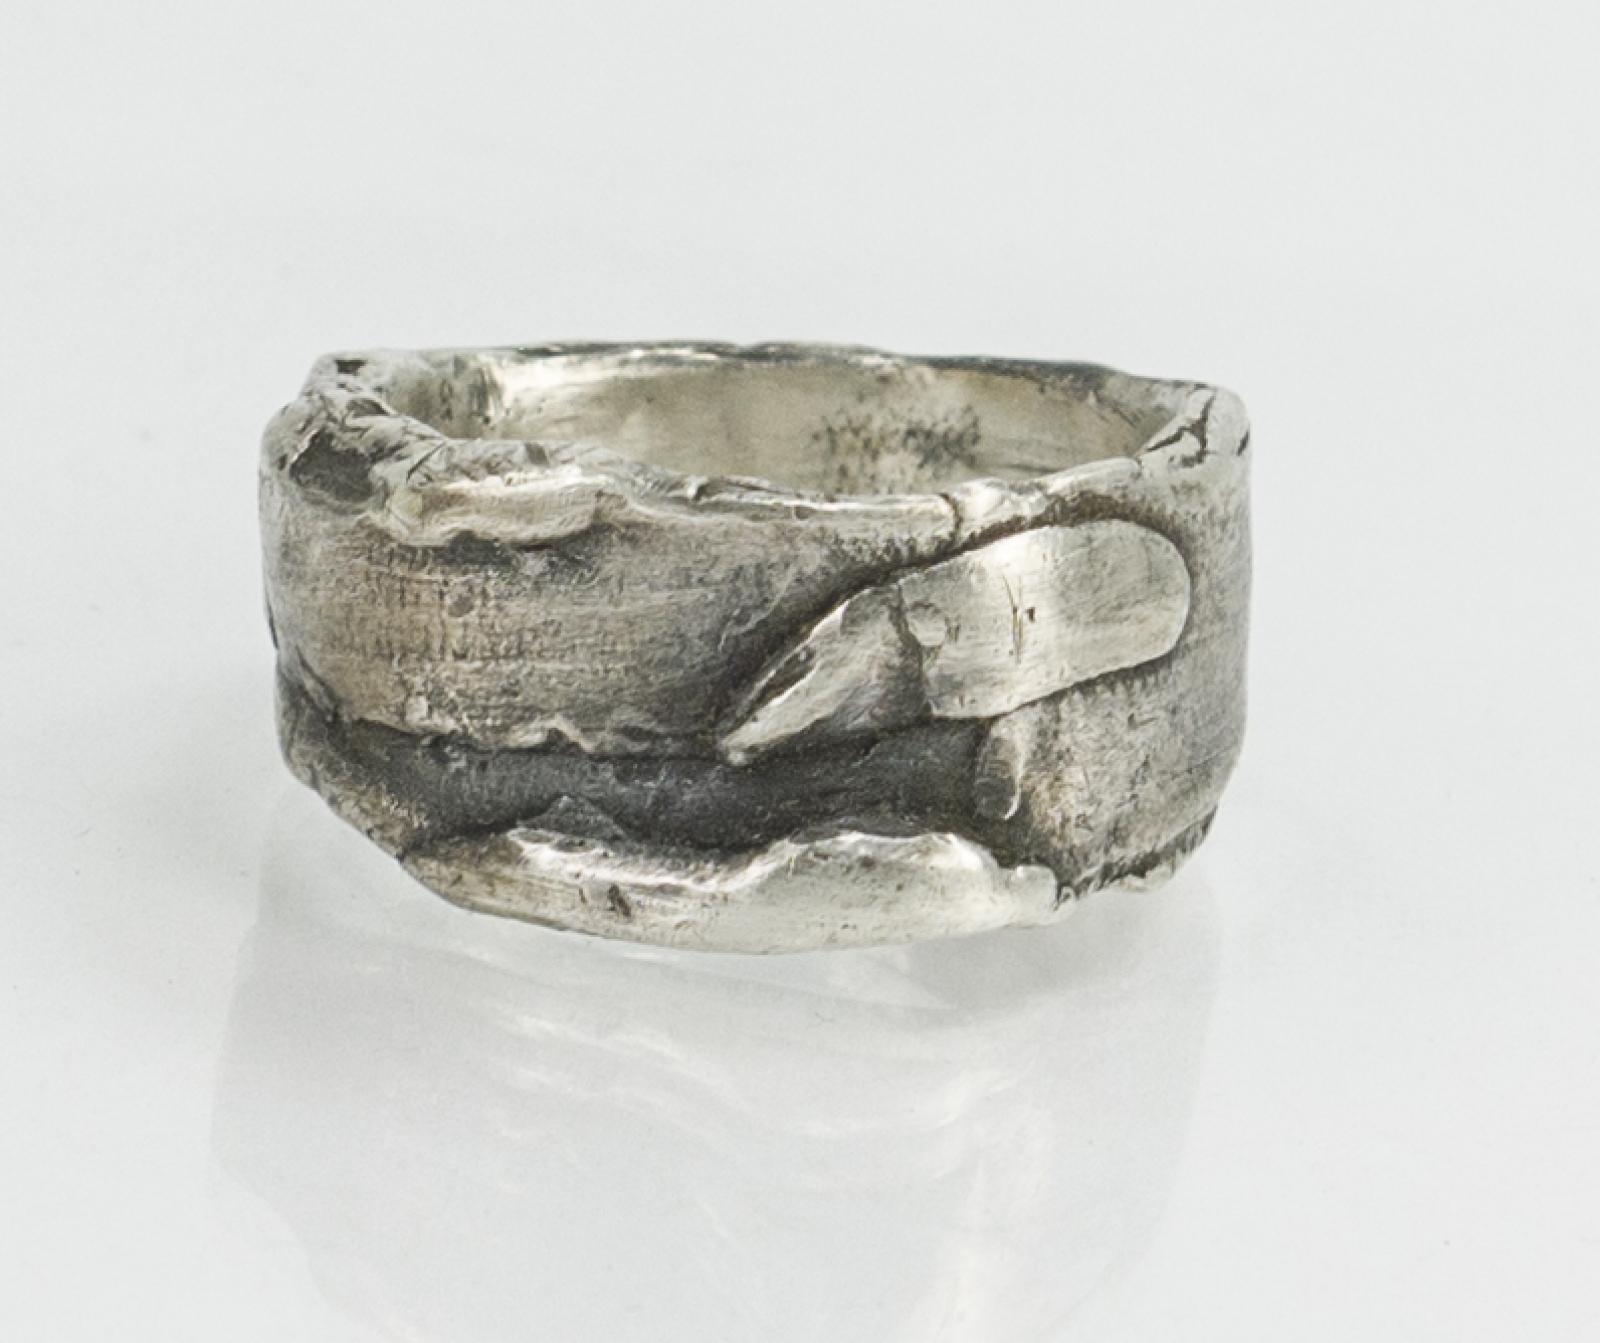 b6c7c8f6d9 Men S Chunky Anic Style Sterling Silver Ring Jomama. Chunky Hammered Silver  Ring. Chunky Hammered Silver Ring By Lilia Nash Jewellery